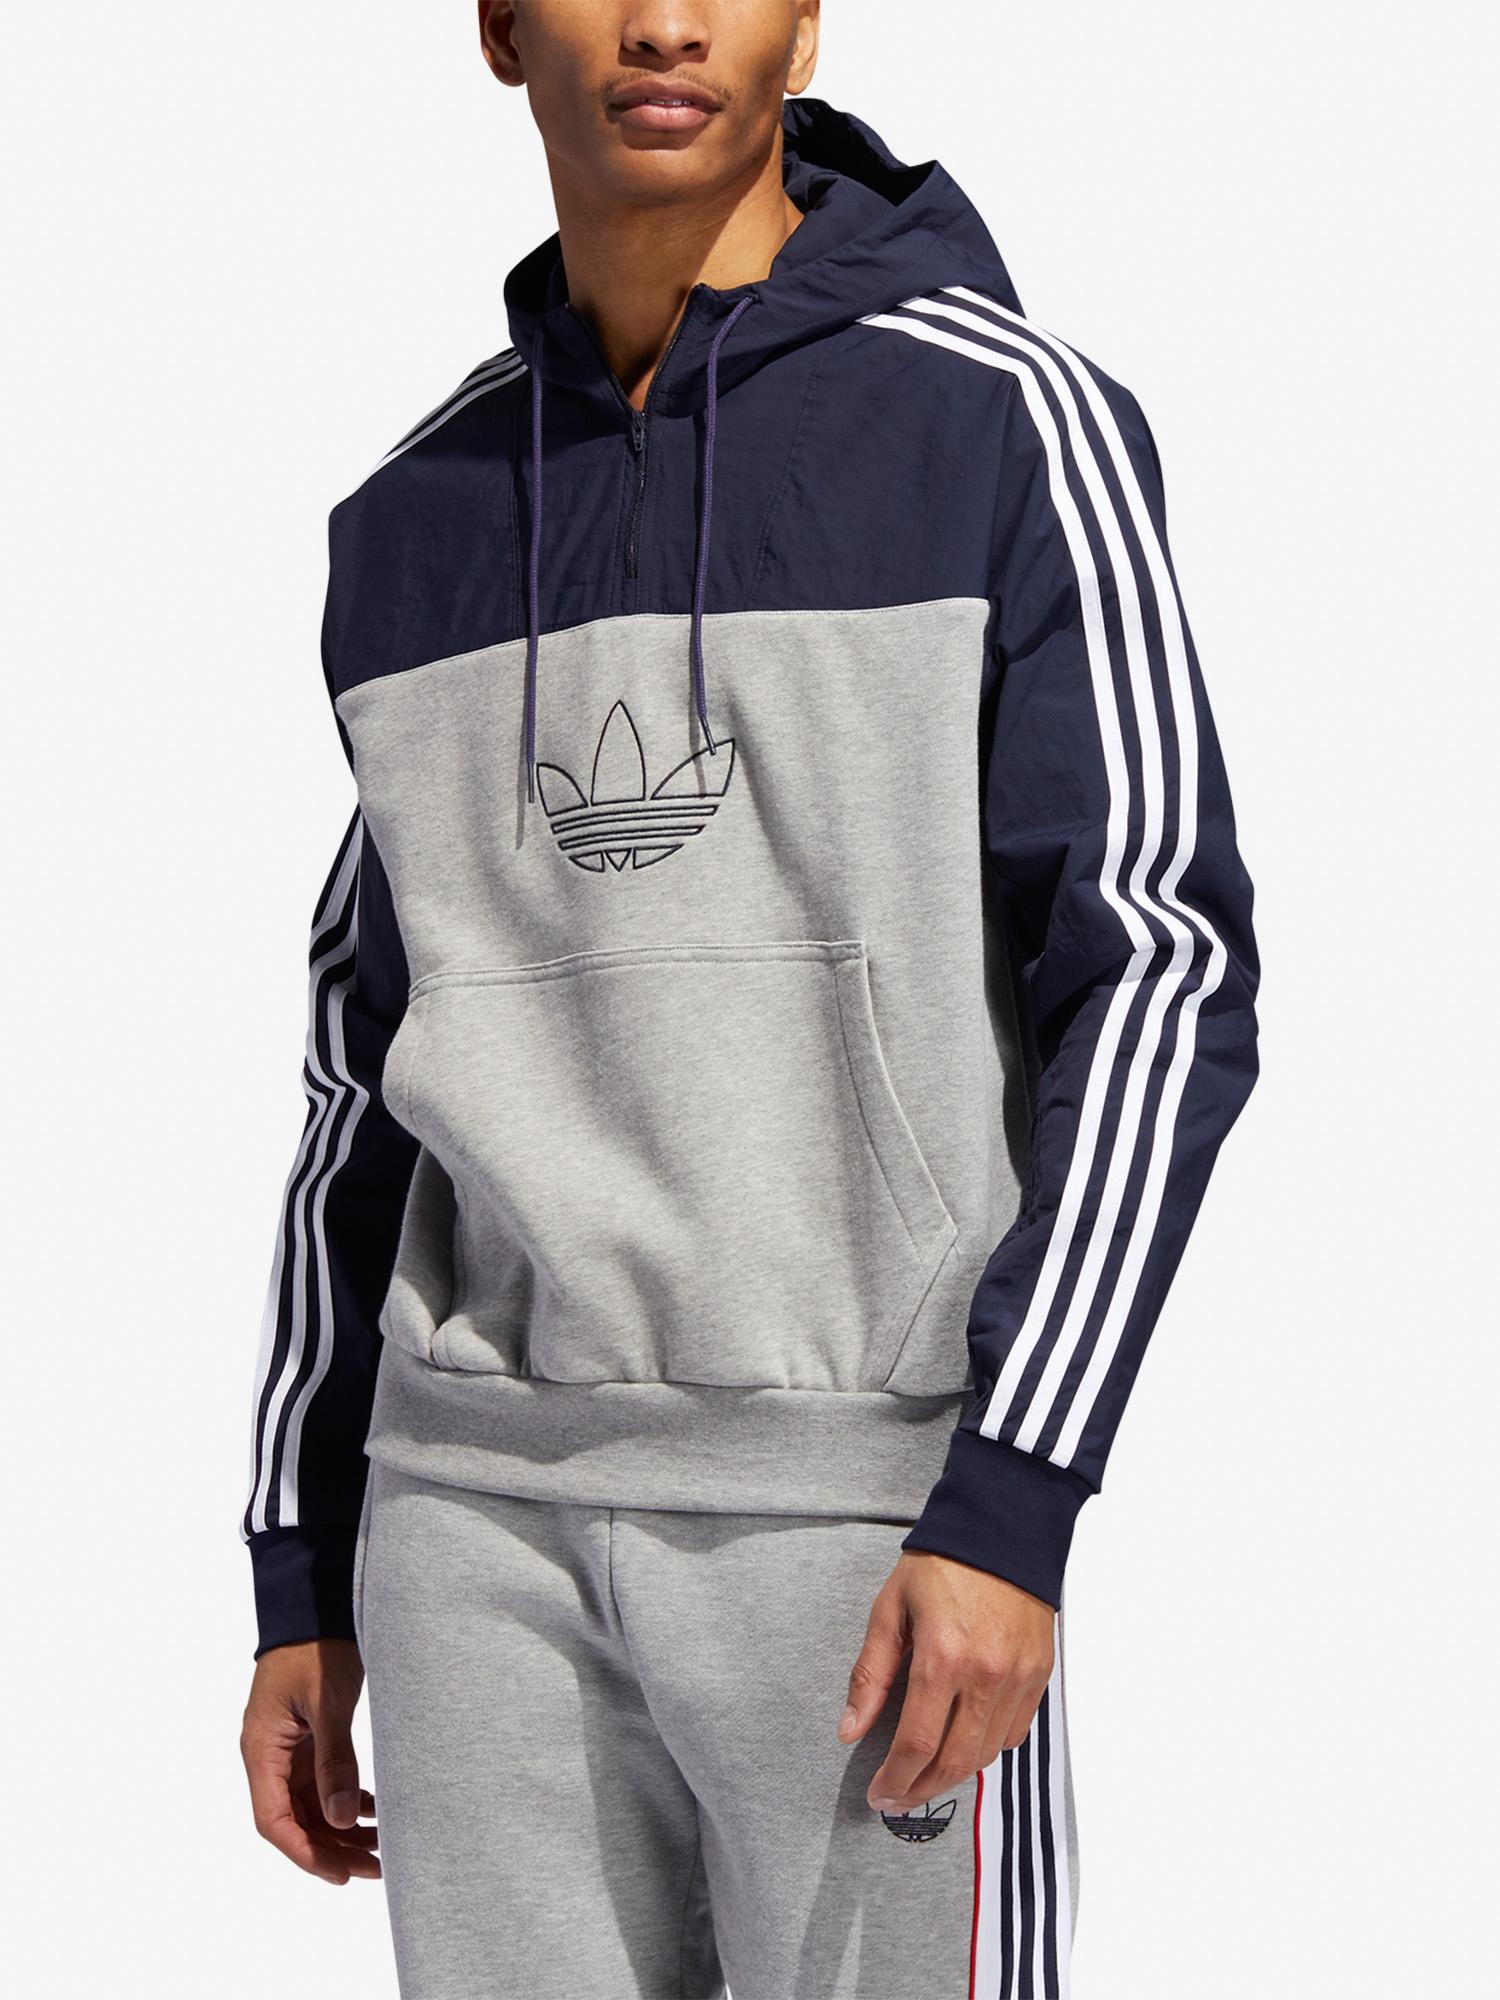 Adidas Originals Mixed Hoody Sweatshirt